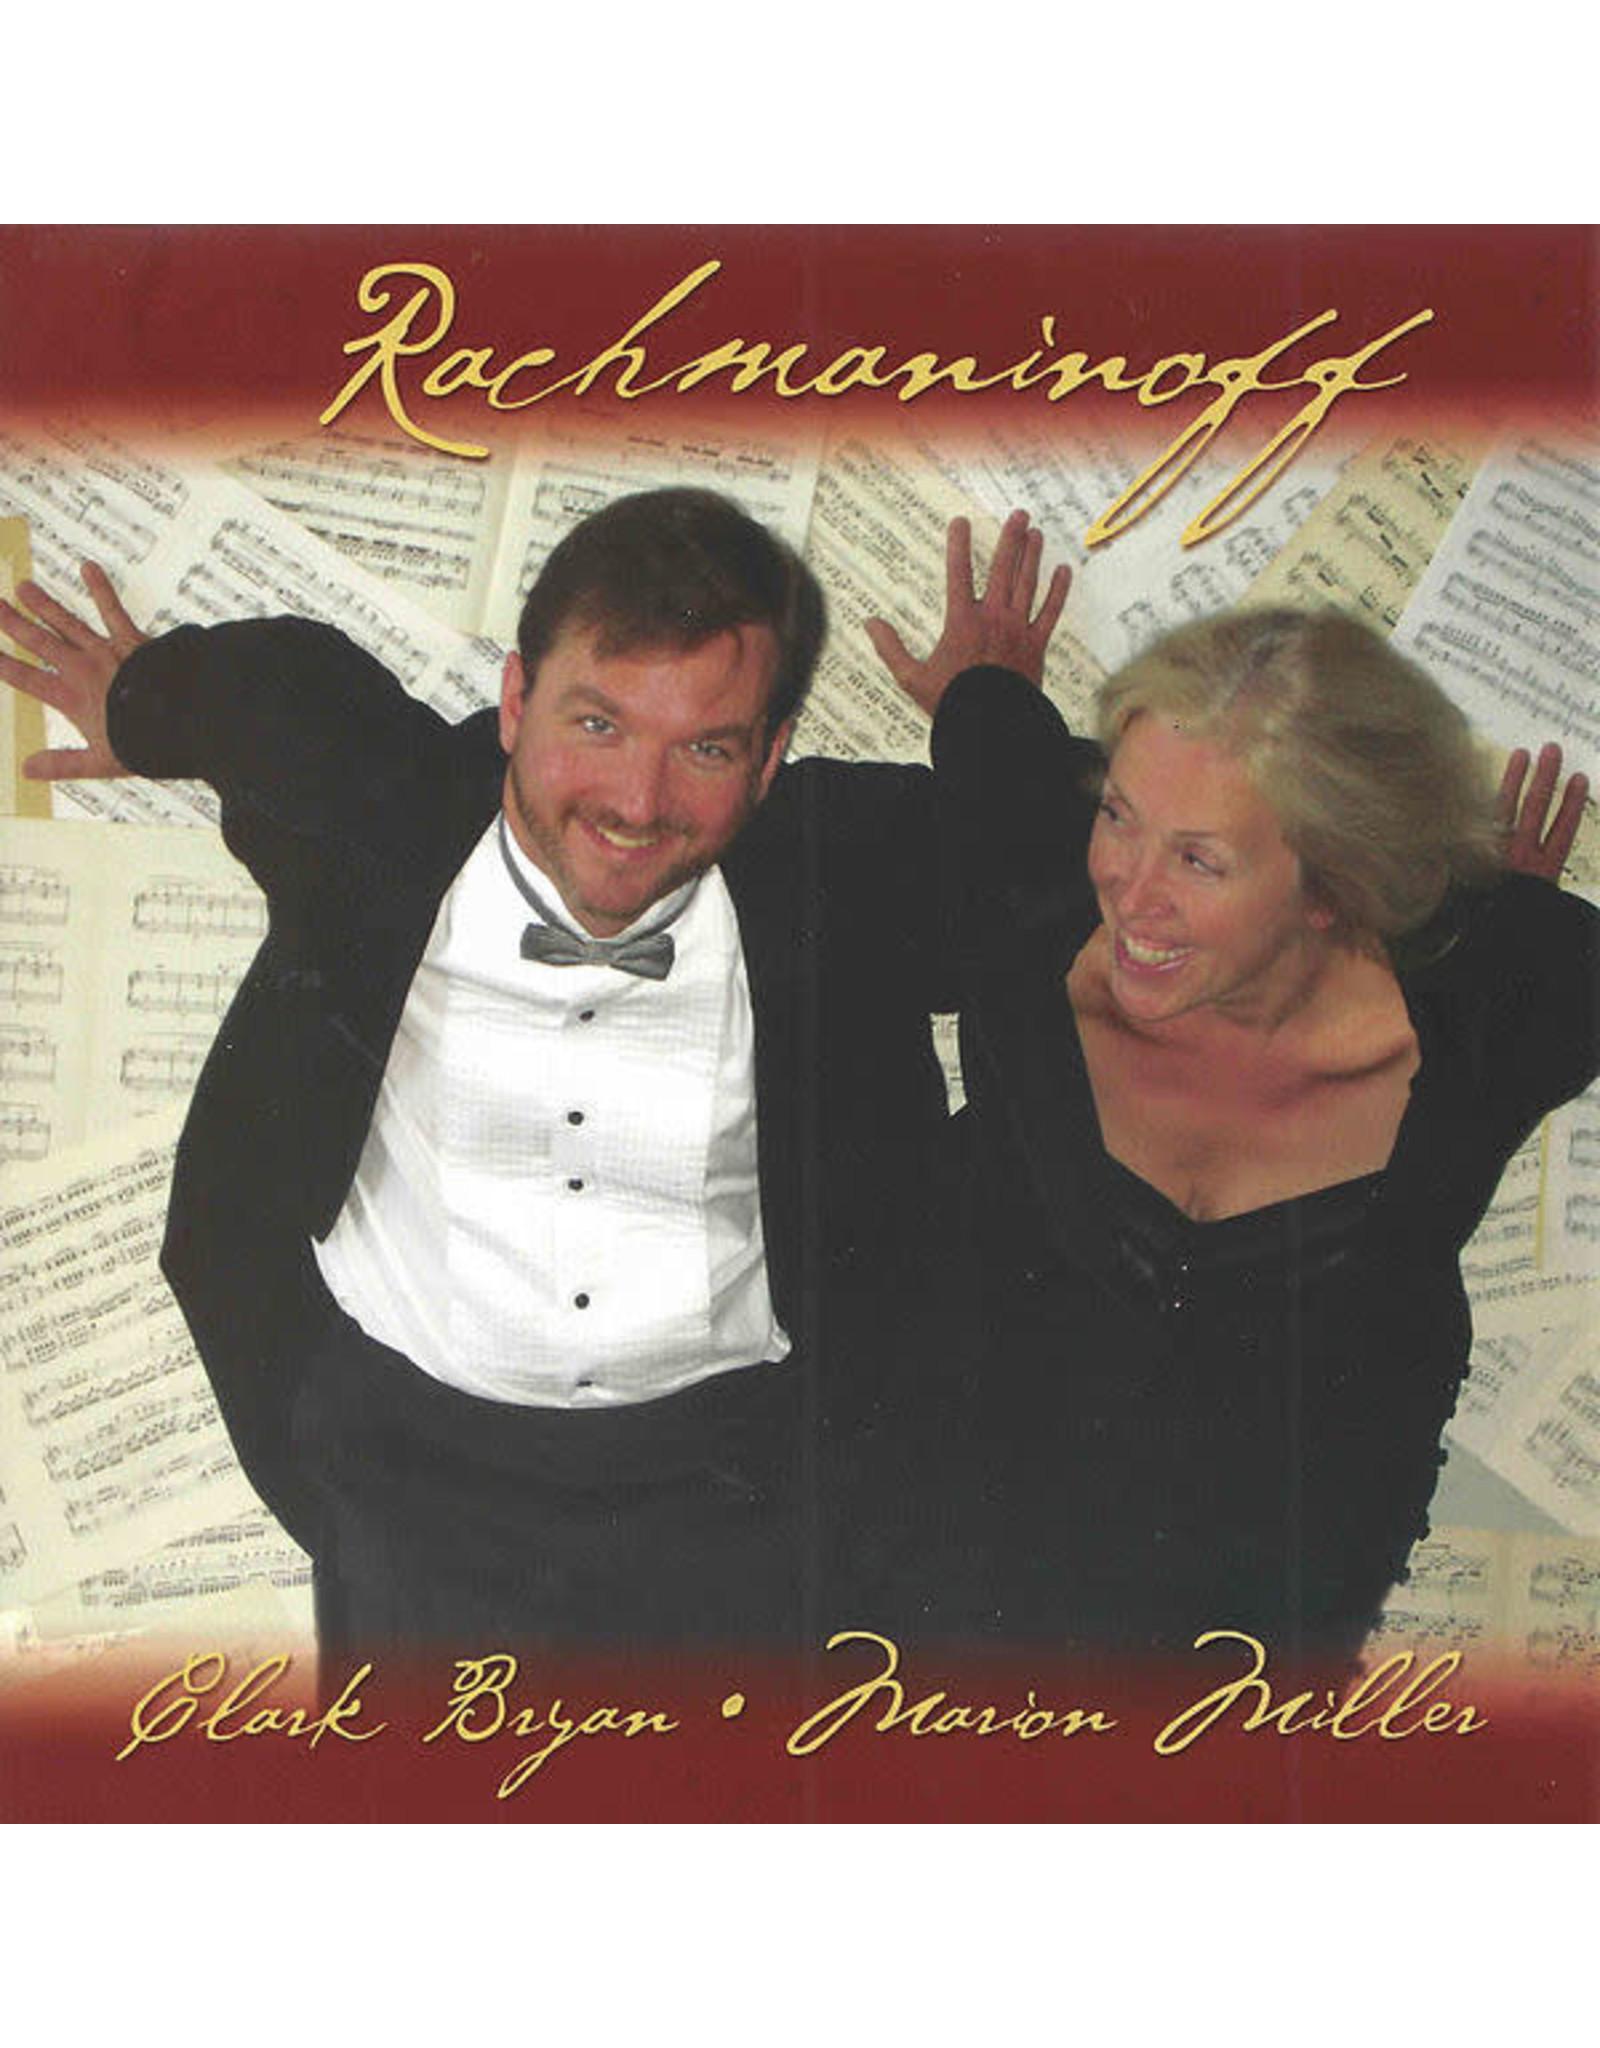 Bryan, Clark & Marion Miller - Rachmaninoff CD